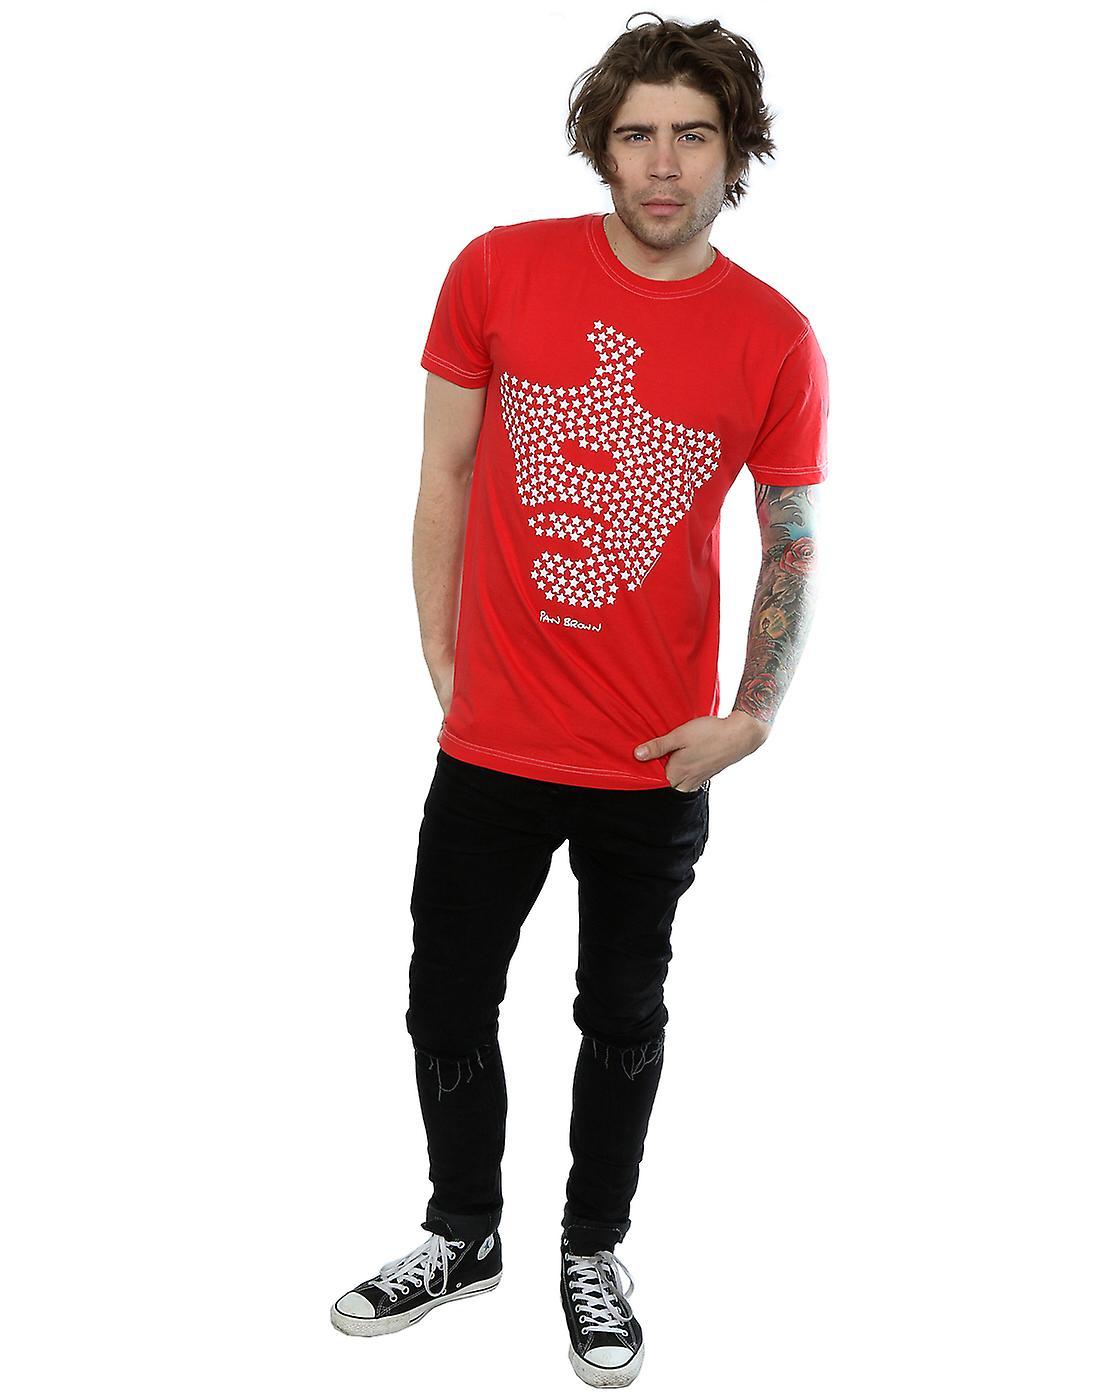 Aftershow Men's Ian Brown Star Face T-Shirt